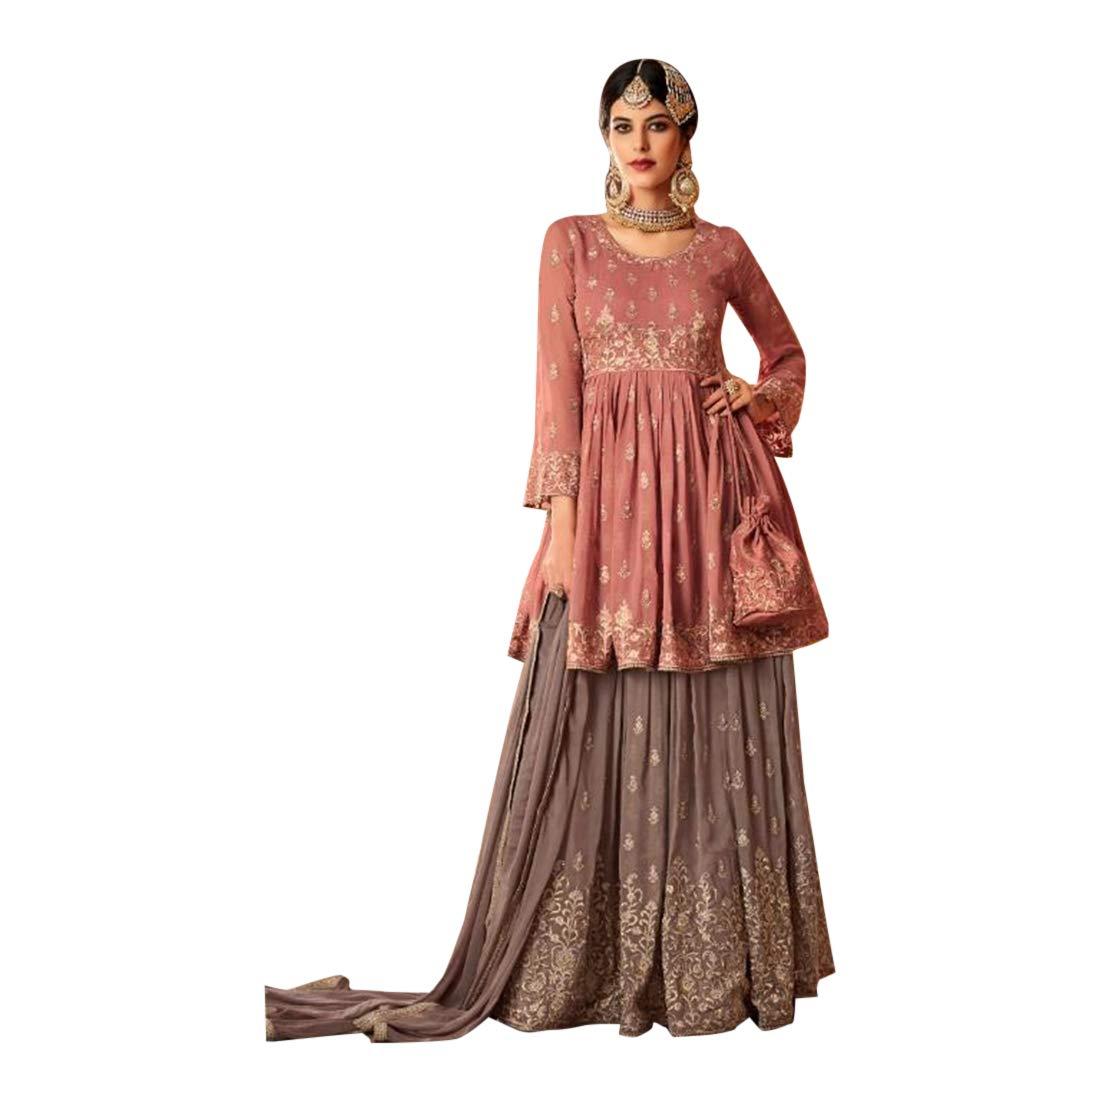 Designer Pure Georgette Short Kurti Sharara suit with Dupatta for Women Indian Muslim dress 7705